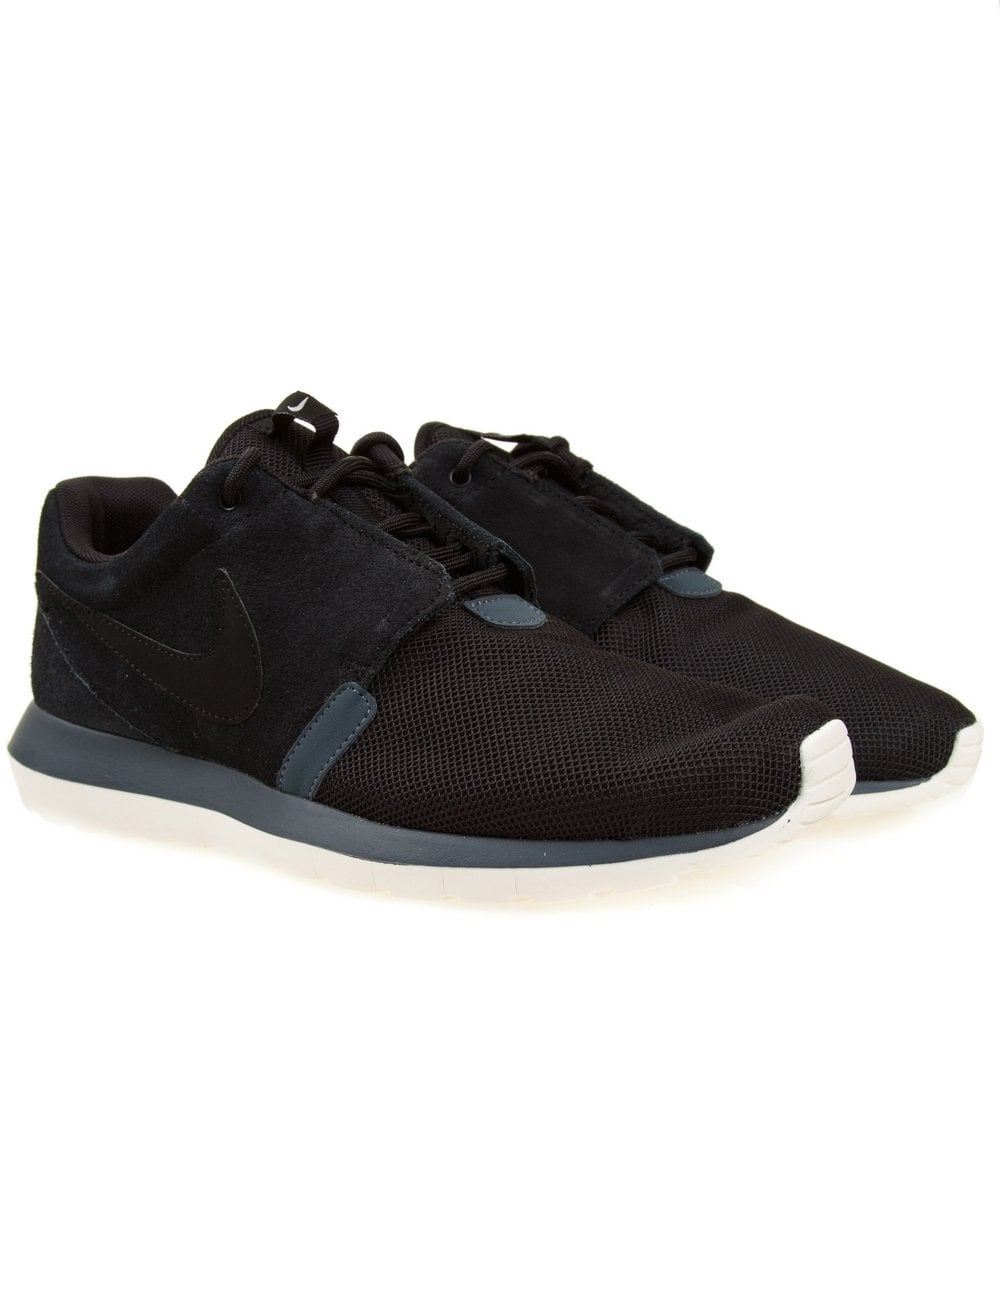 c3c47a73f052 Nike Rosherun NM - Black Black - Footwear from Fat Buddha Store UK